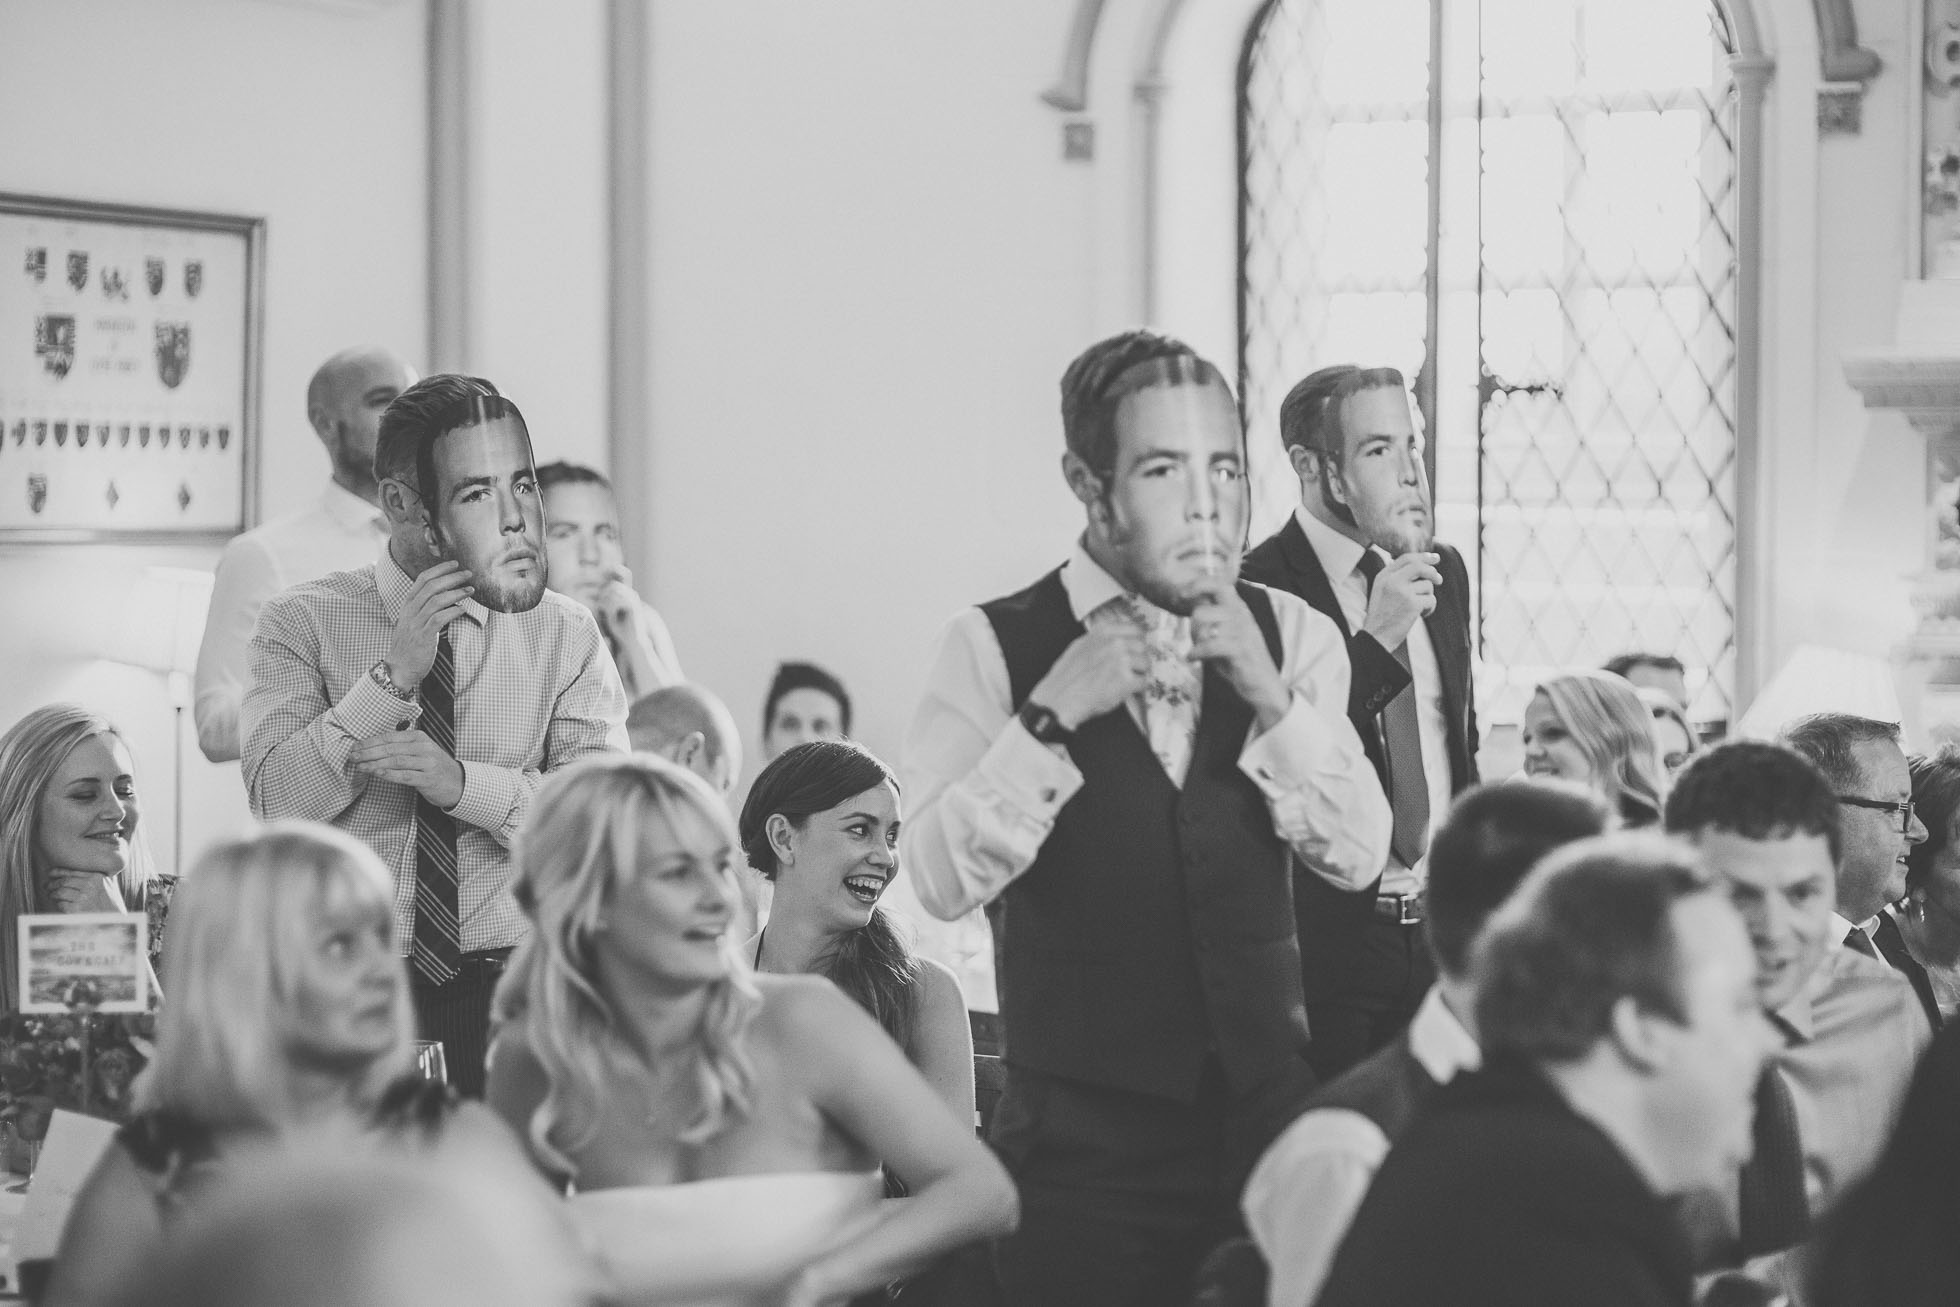 denton-hall-wedding-photographer-60.jpg